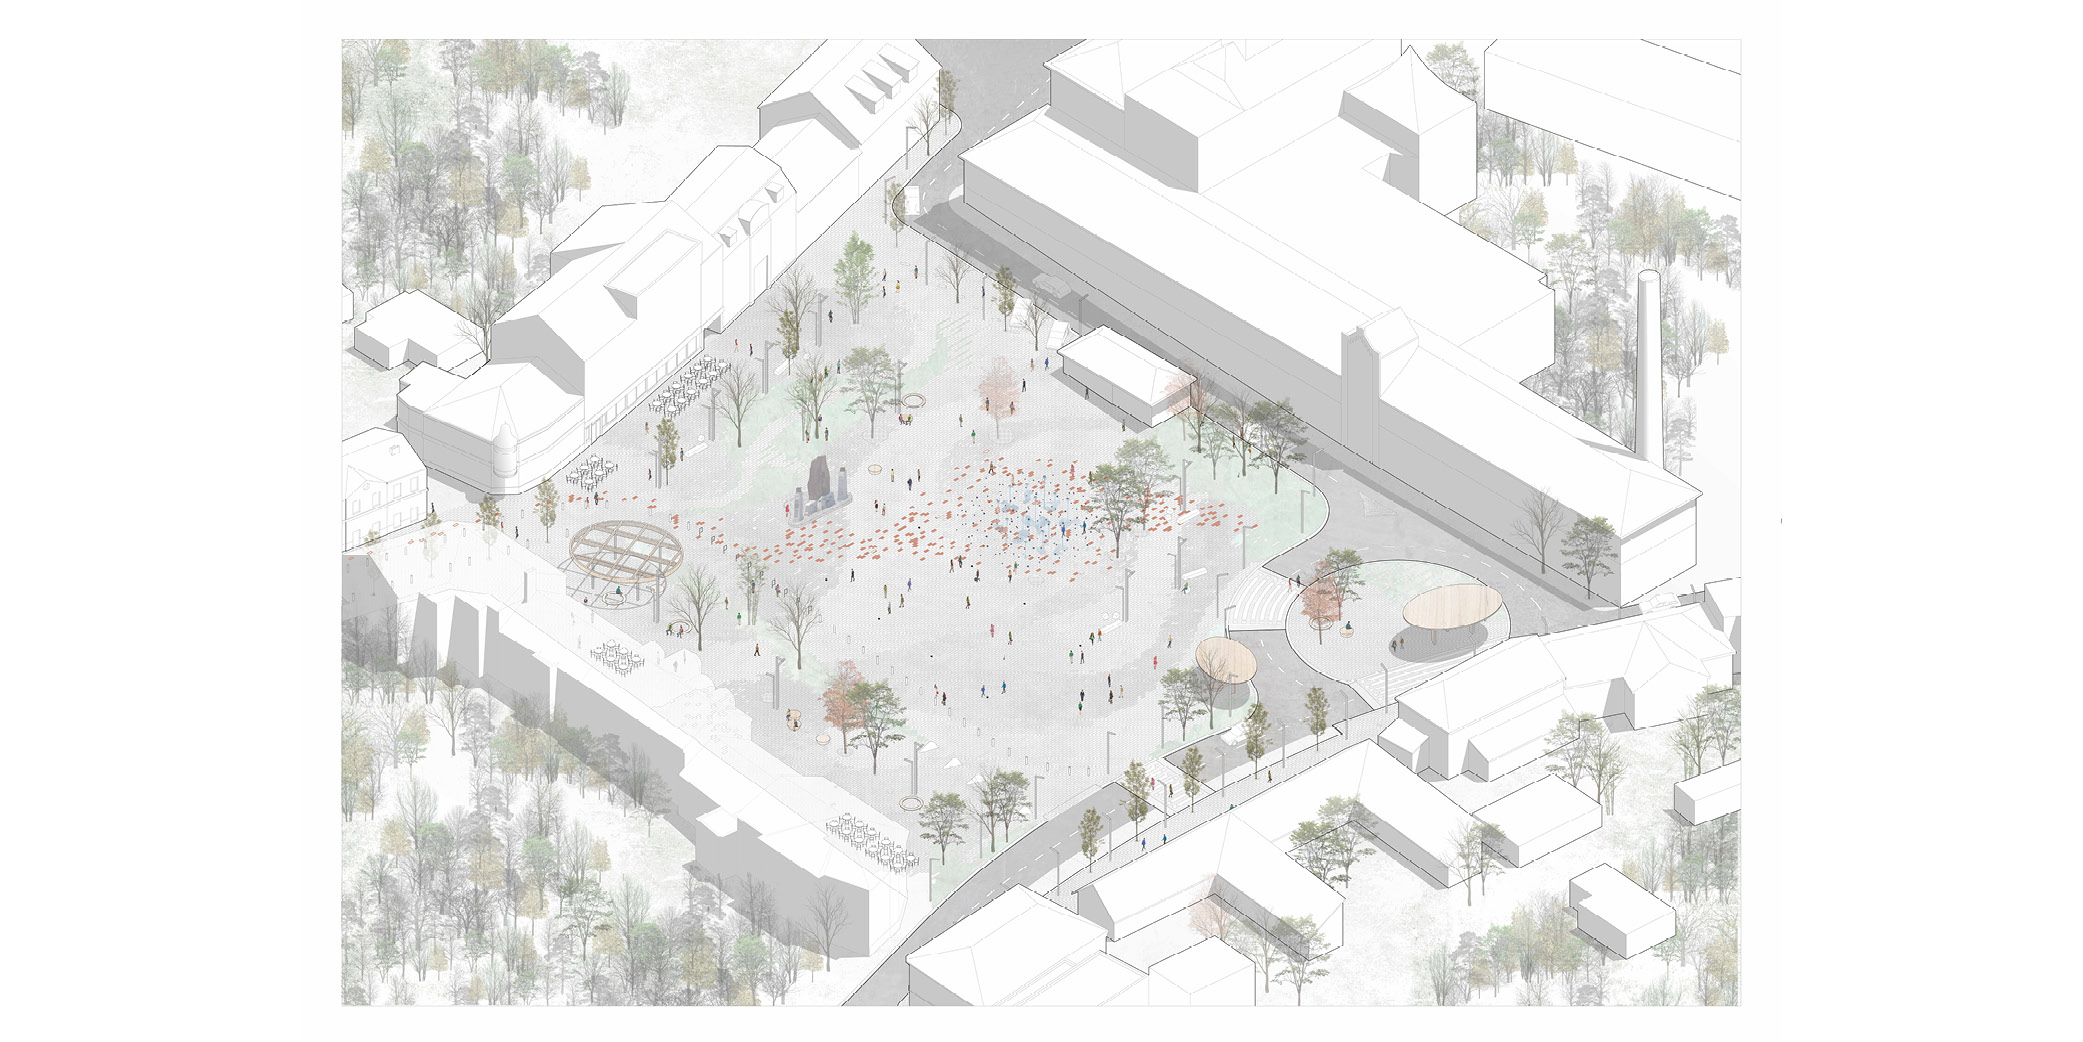 OCA architects Zbraslav square architecture competition Hernan Lleida Ruiz Bernardo Garcia Morales